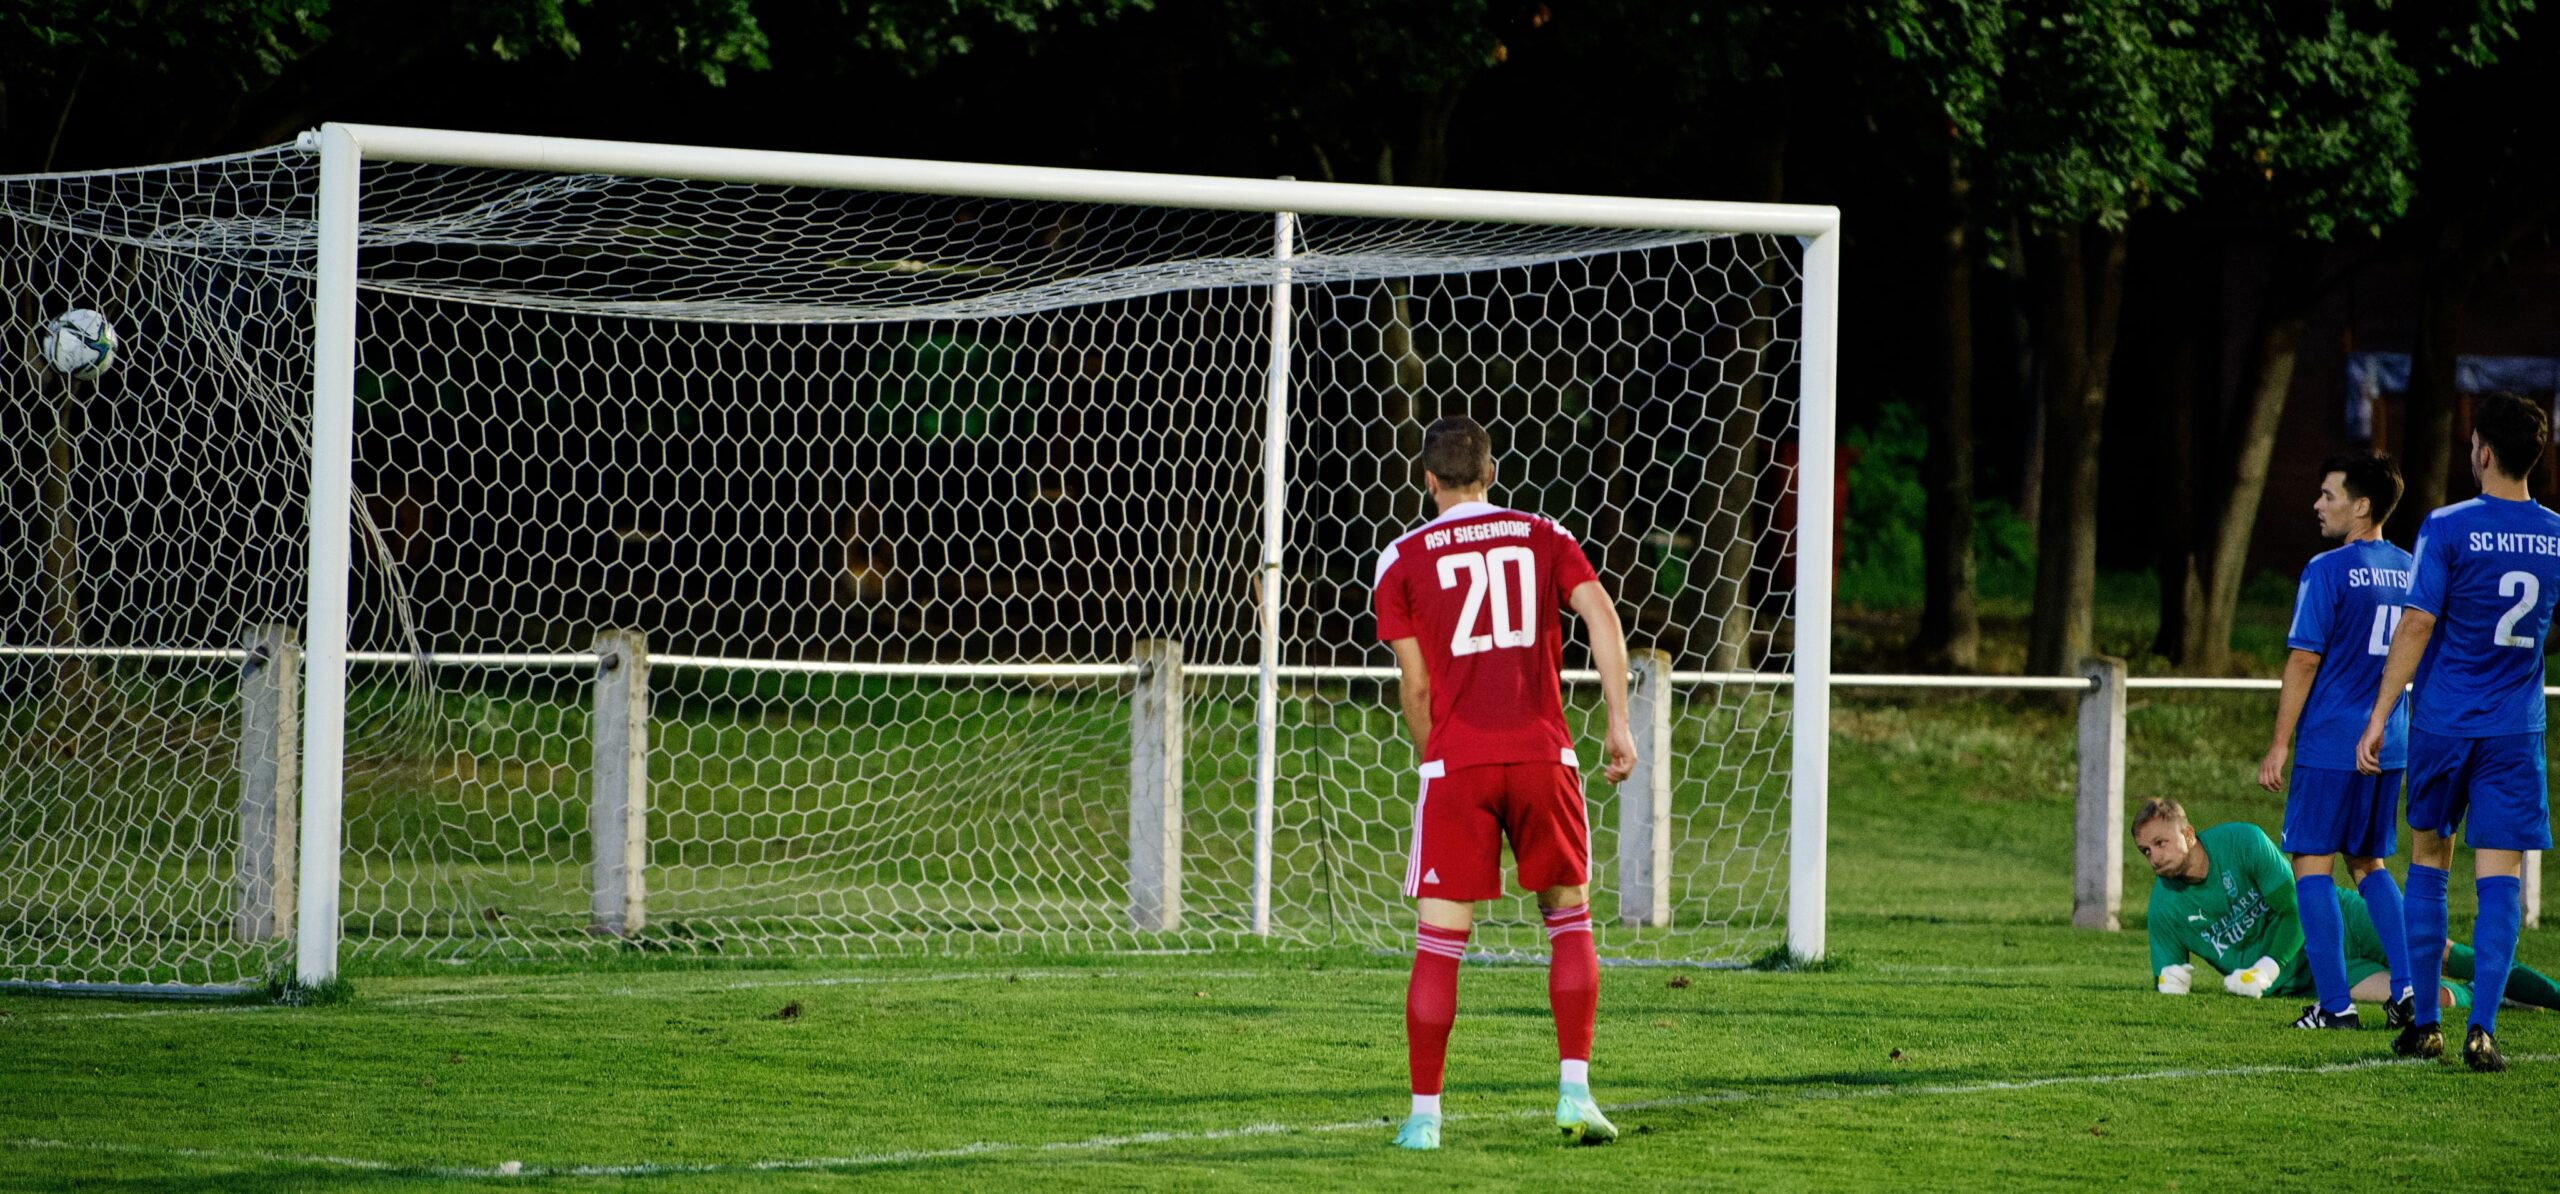 Stanic goal